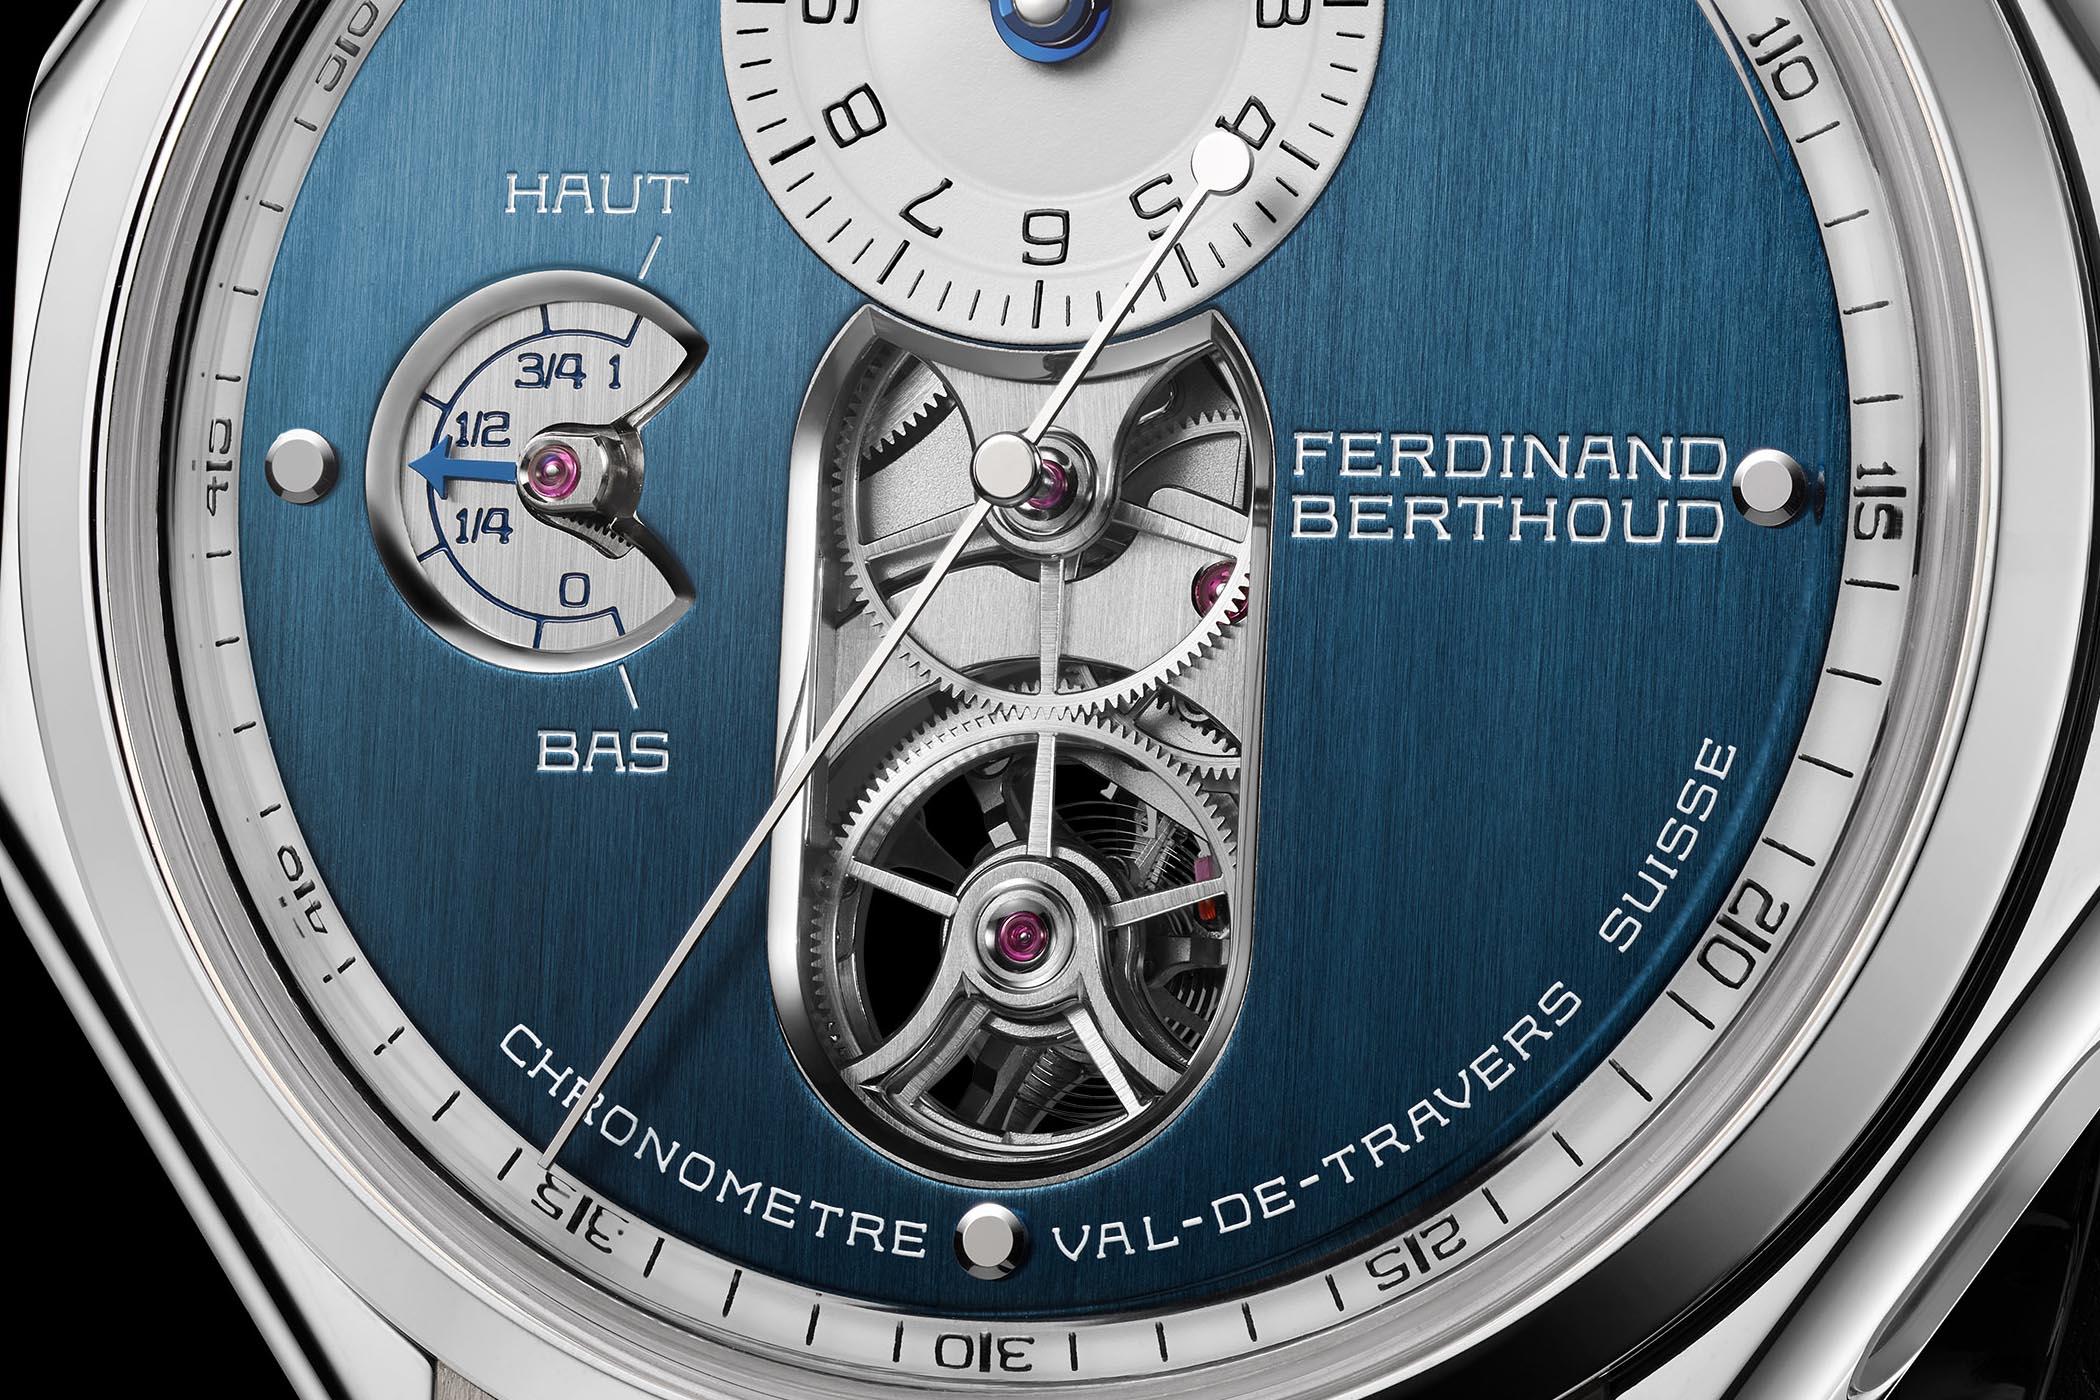 Ferdinand Berthoud FB 1.3-1 Sapphire Blue Chronometer